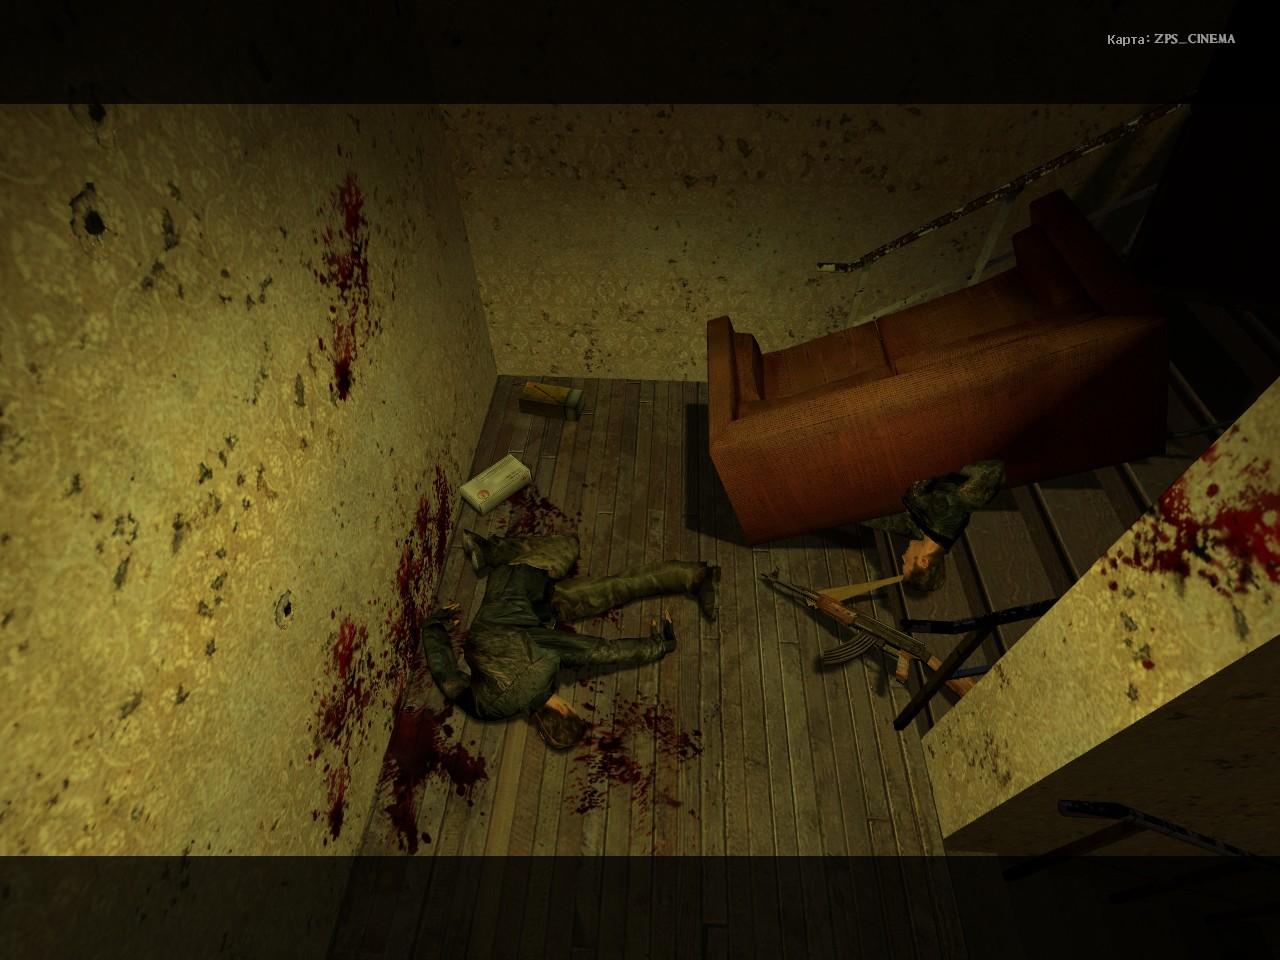 zps_cinema0001.jpg - Half-Life 2 ZPS